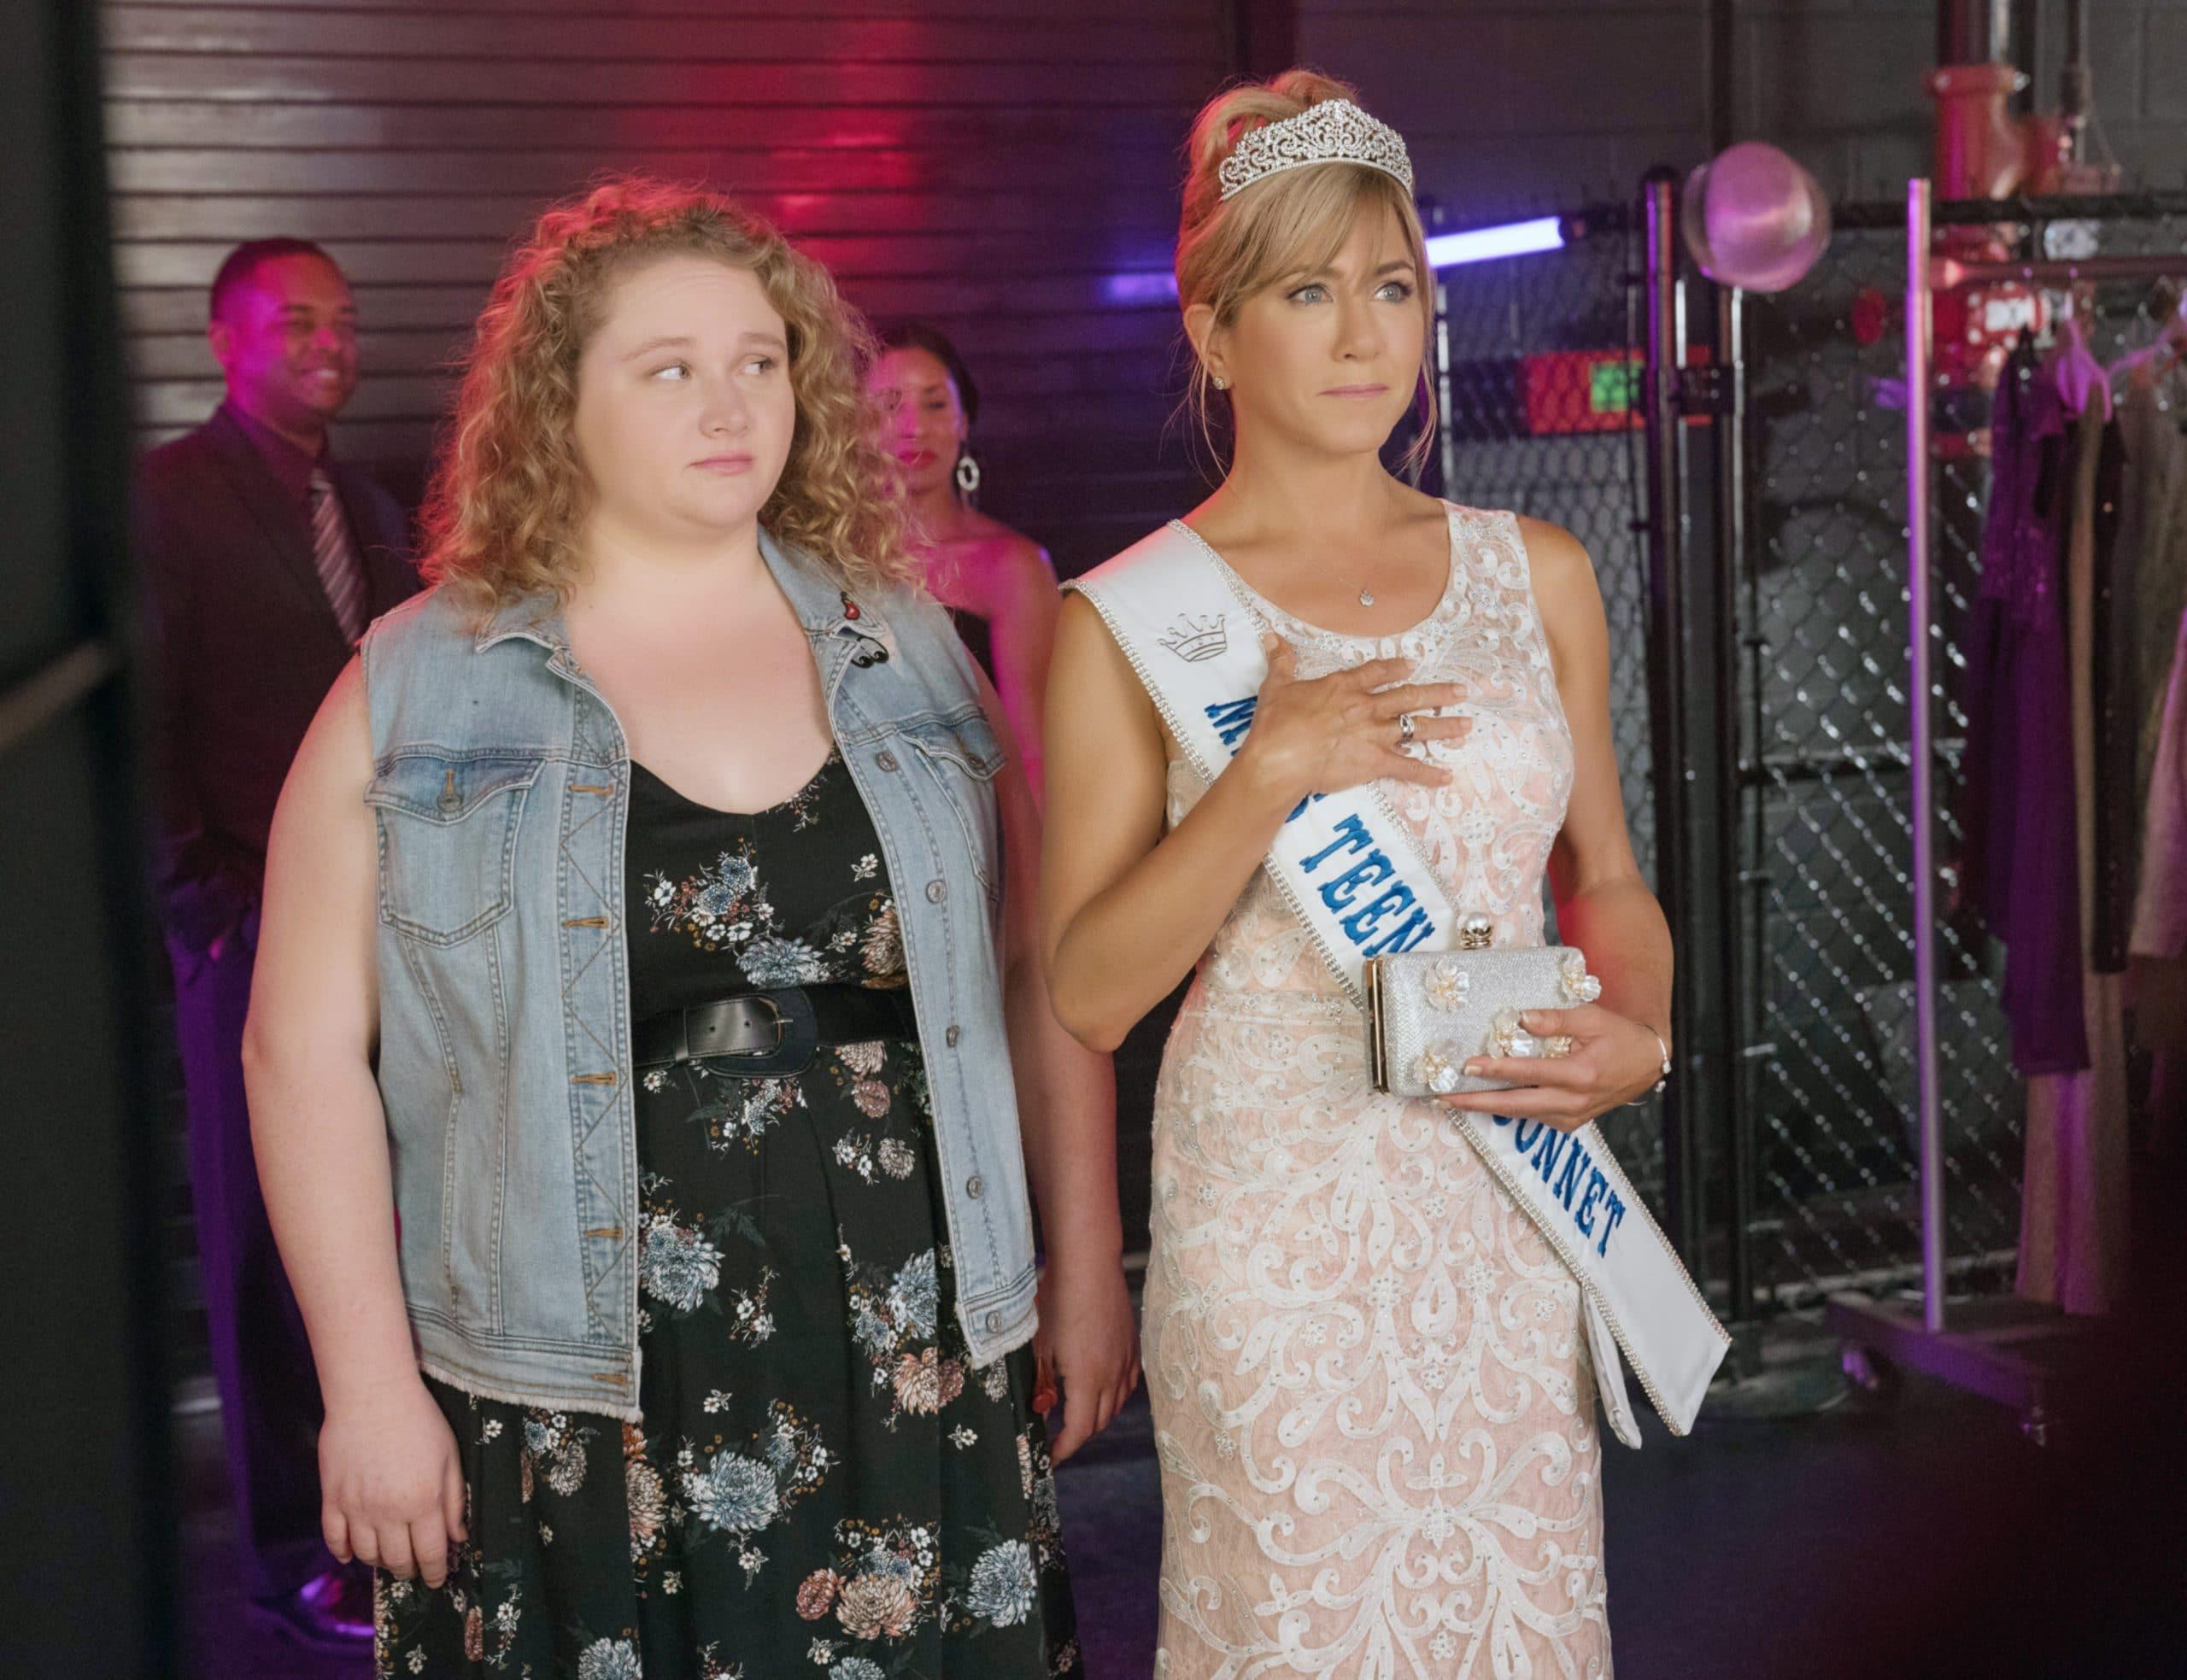 DUMPLIN', from left: Danielle Macdonald, Jennifer Aniston, 2018